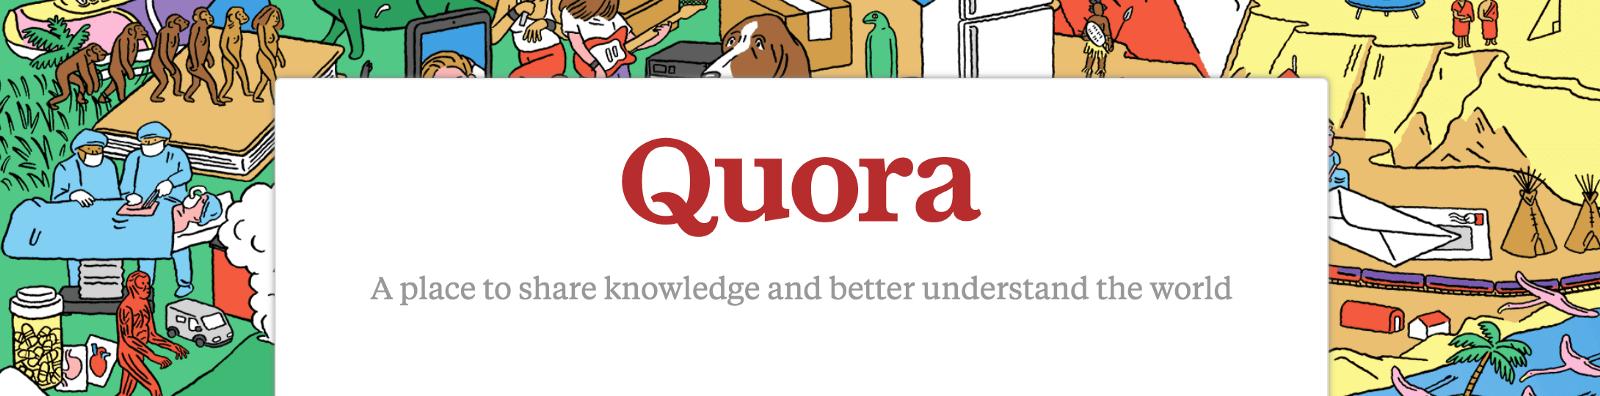 /quora-hacker-noon-partnership-d45f198ea526 feature image